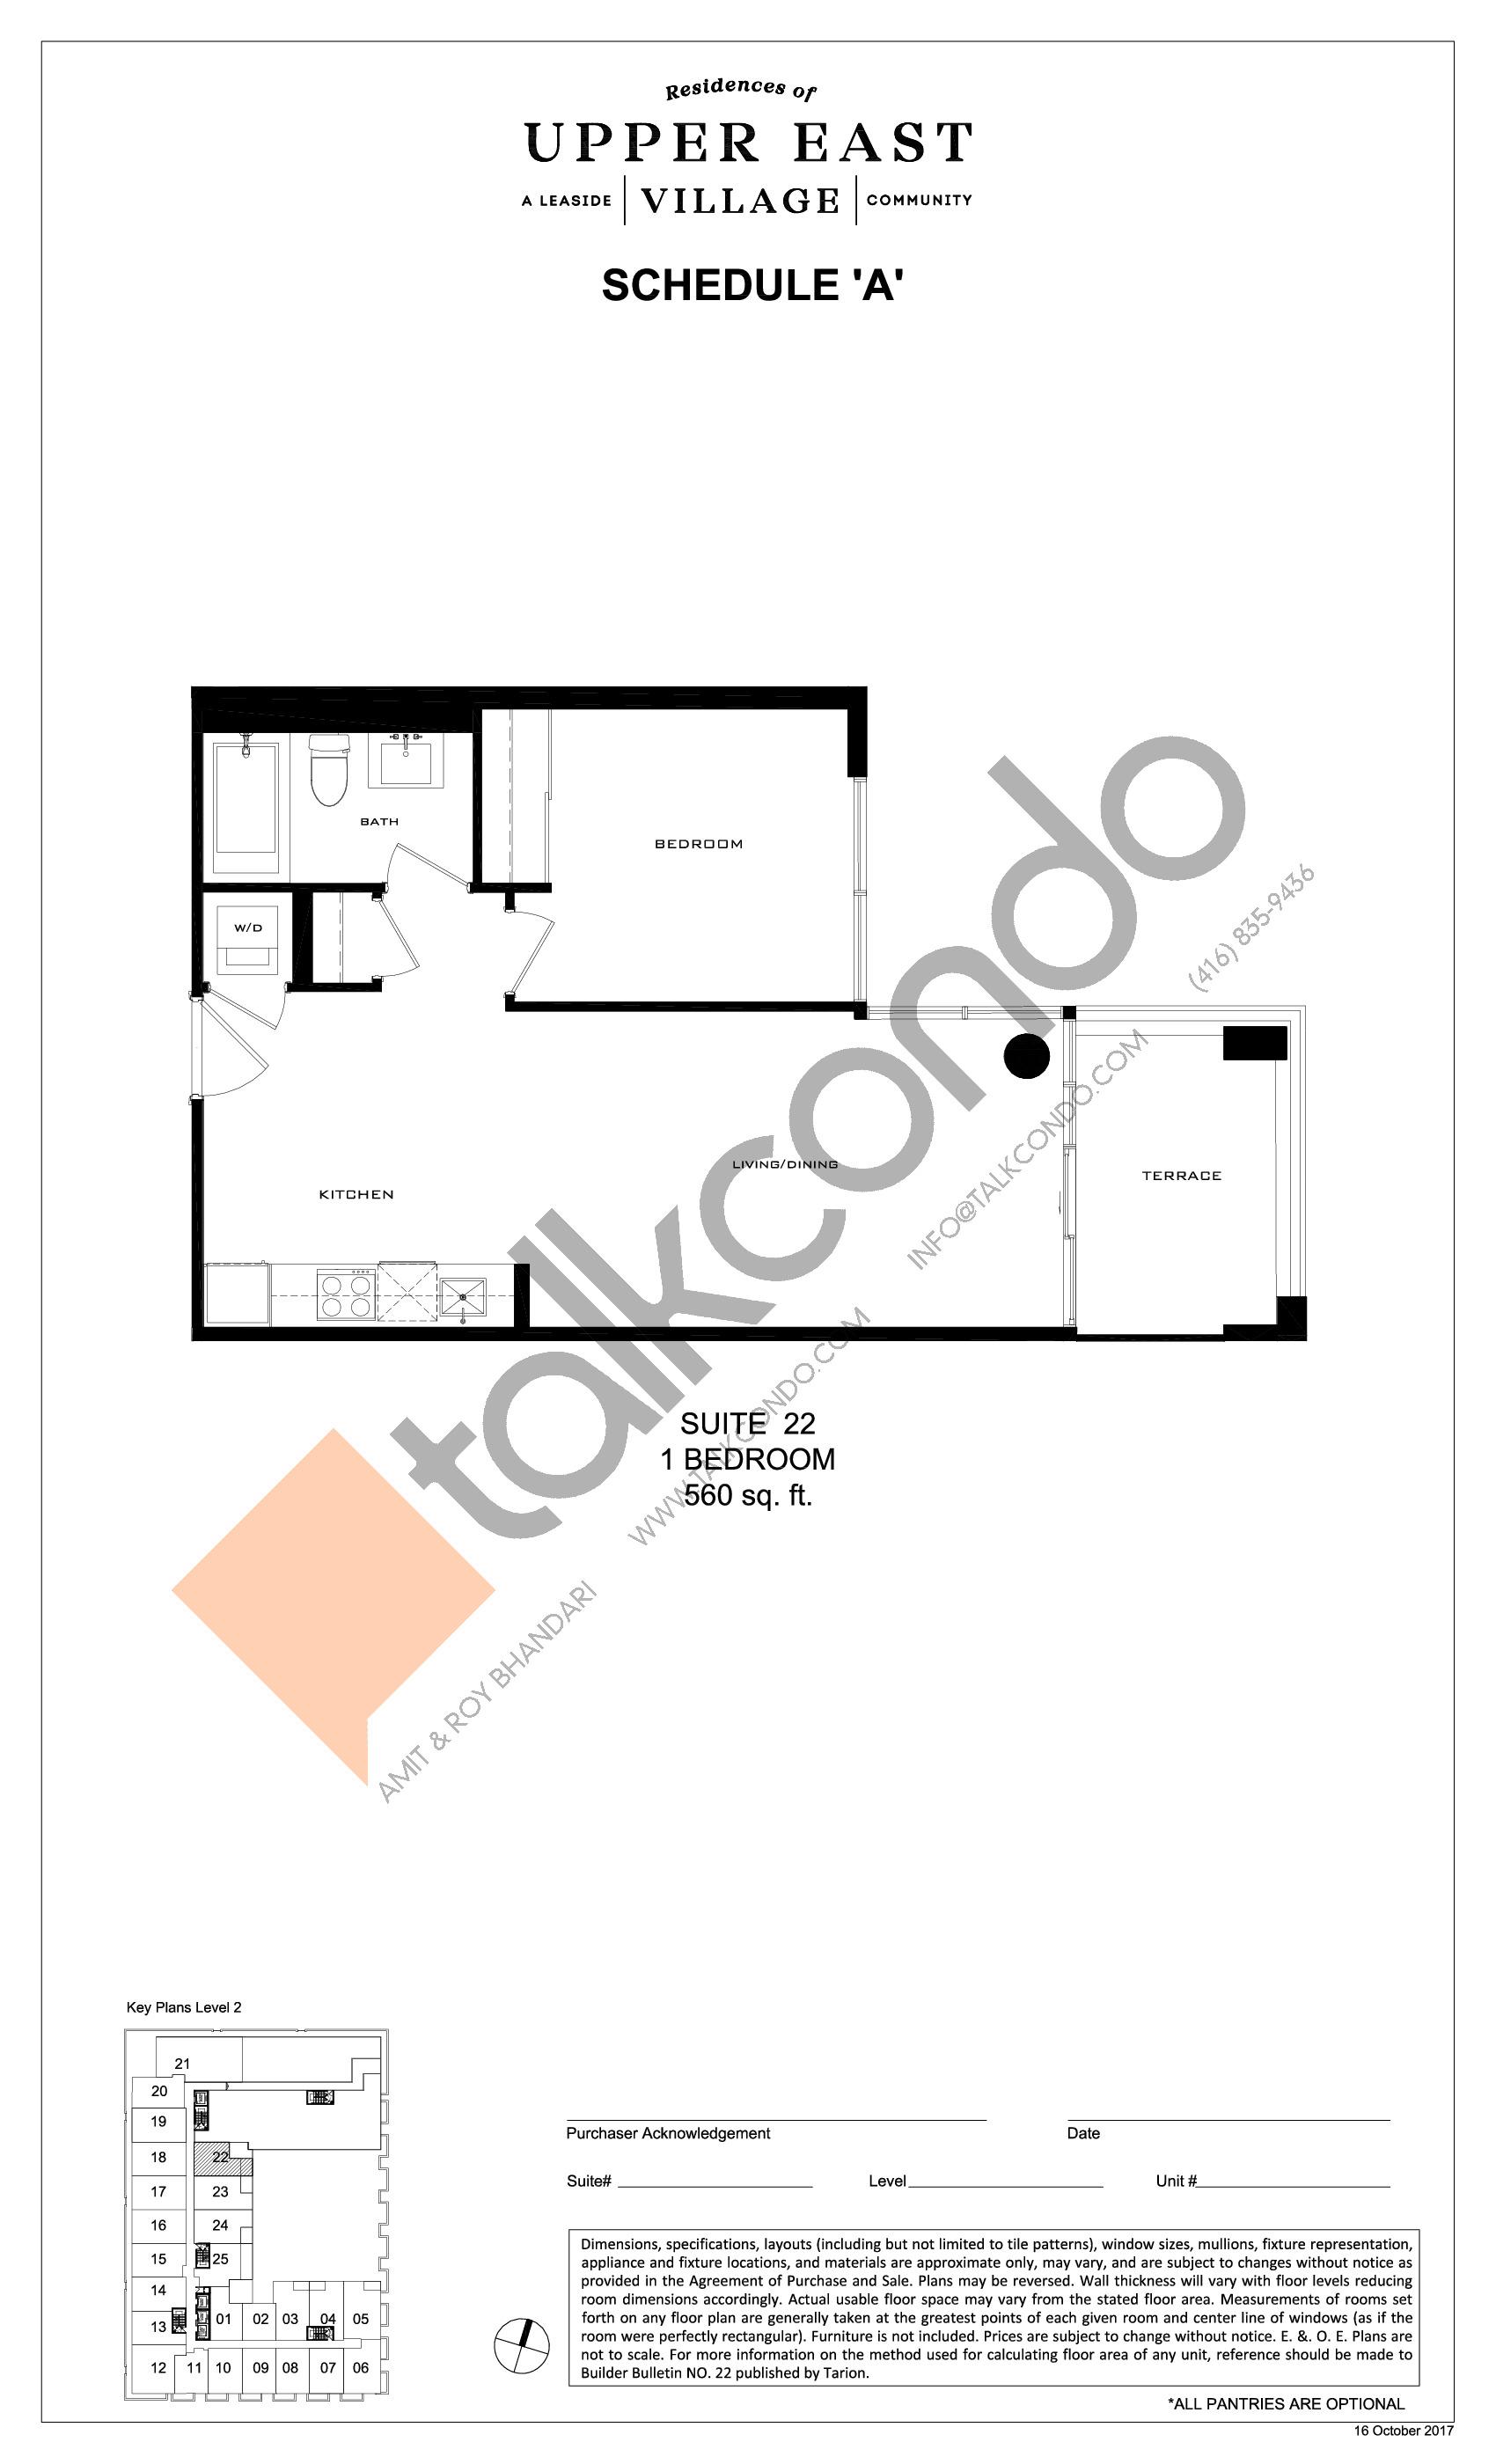 Suite 22 Floor Plan at Upper East Village Condos - 560 sq.ft